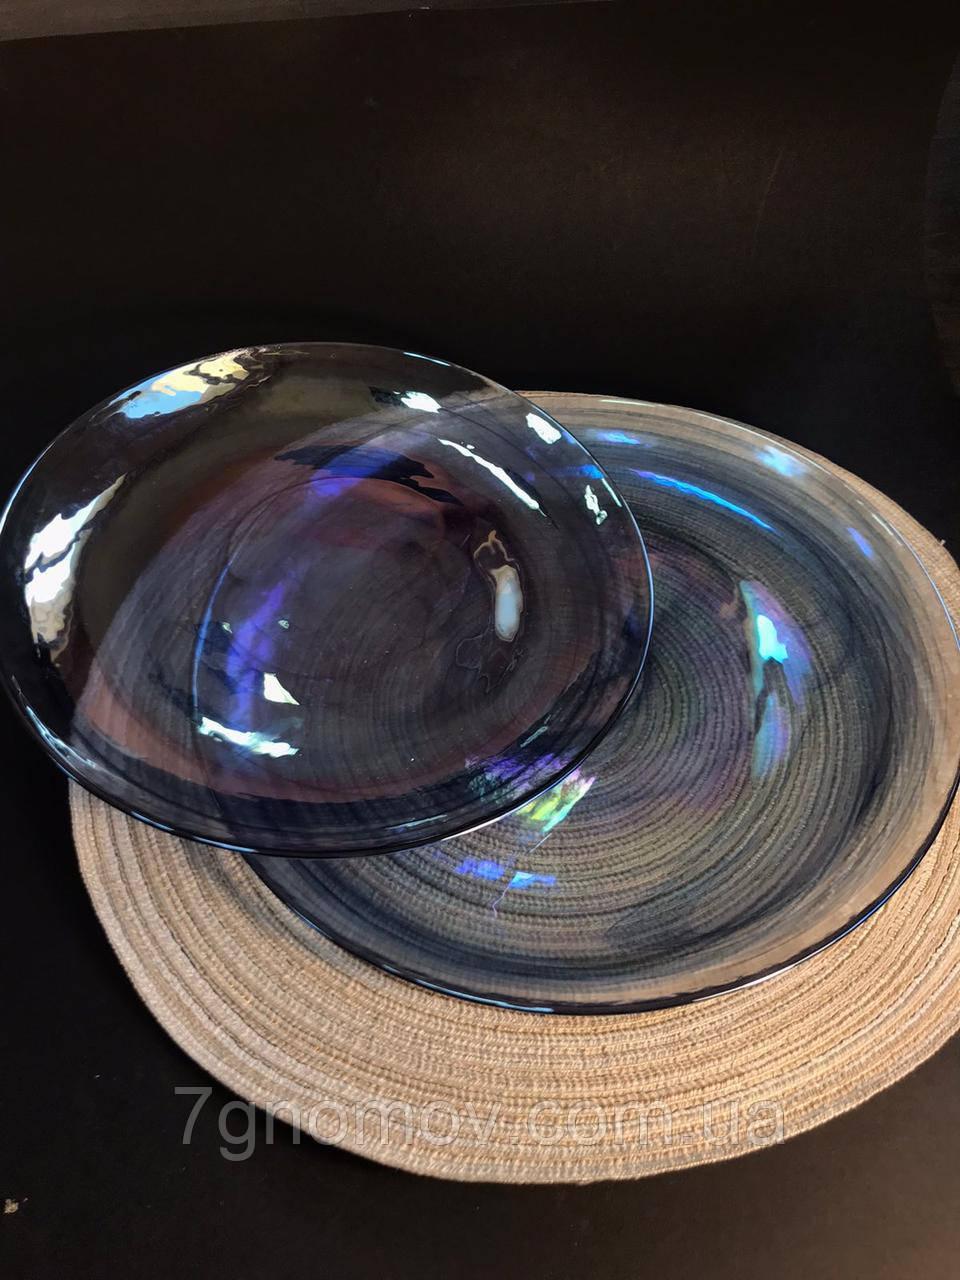 Набор 6 стеклянных обеденных тарелок прозрачно-синий Океан 27 см арт. 16112-14 - фото 6